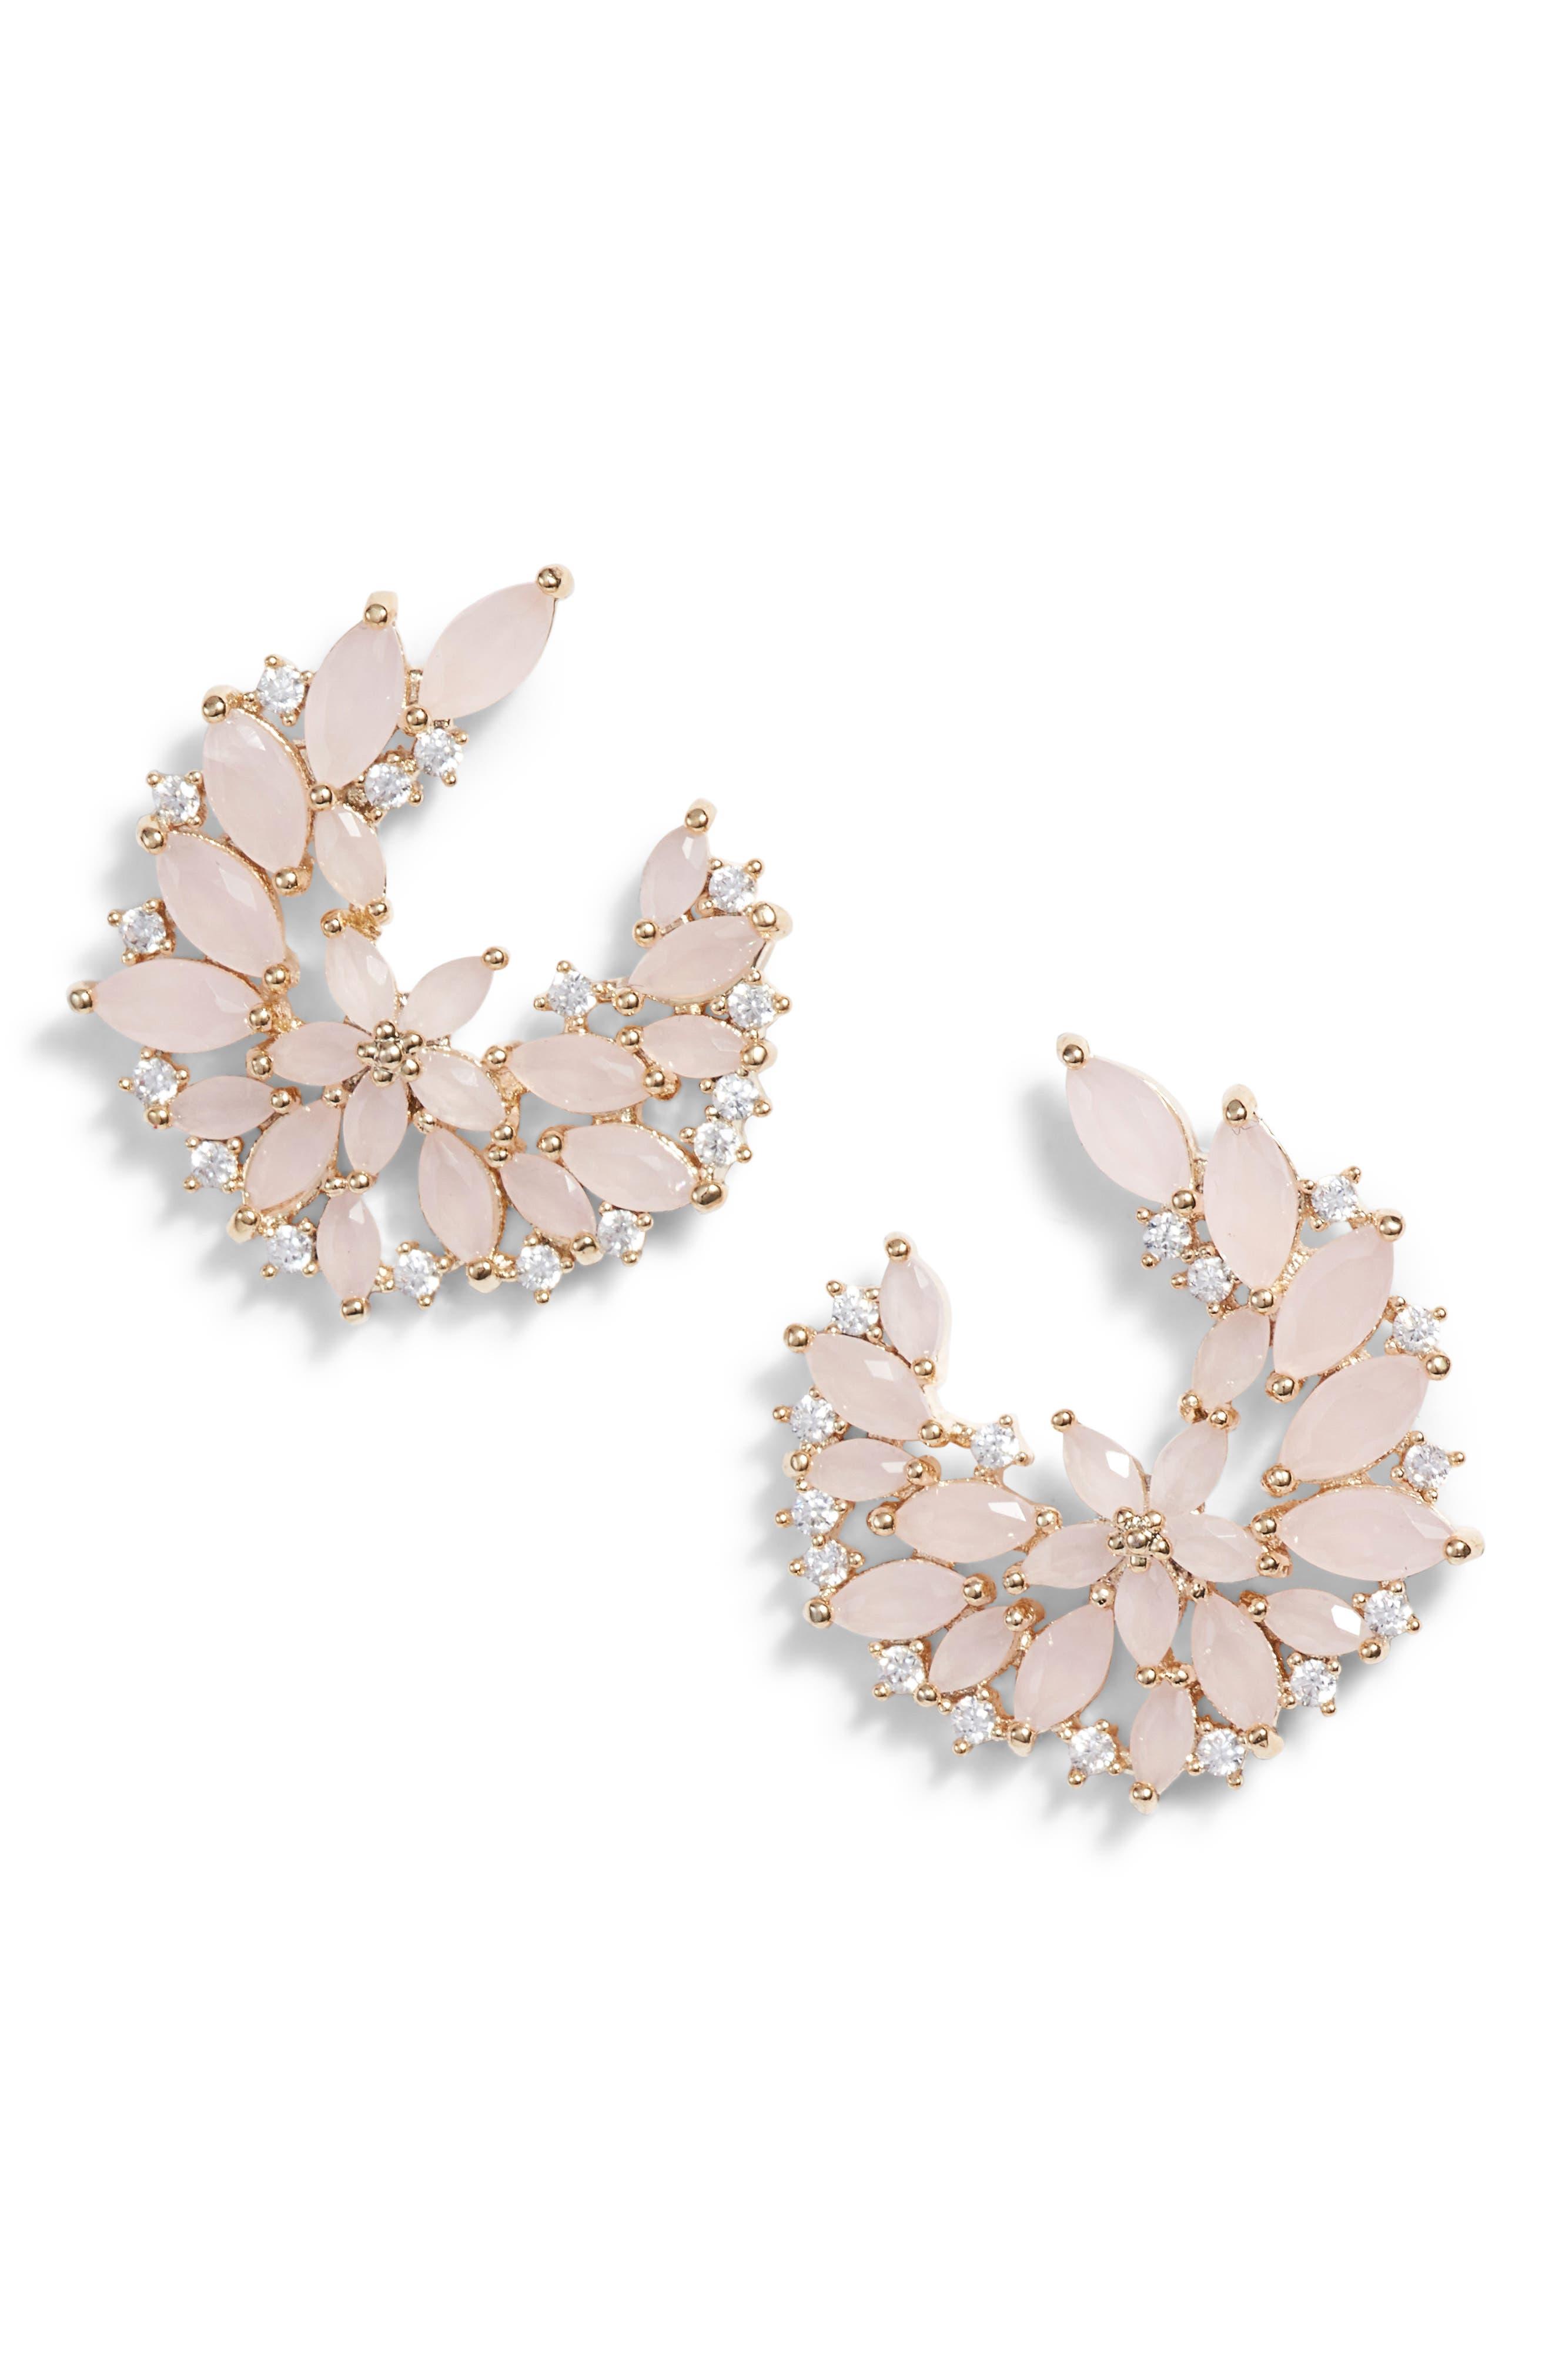 SEREFINA Floral Cubic Zirconia Earrings in Blush